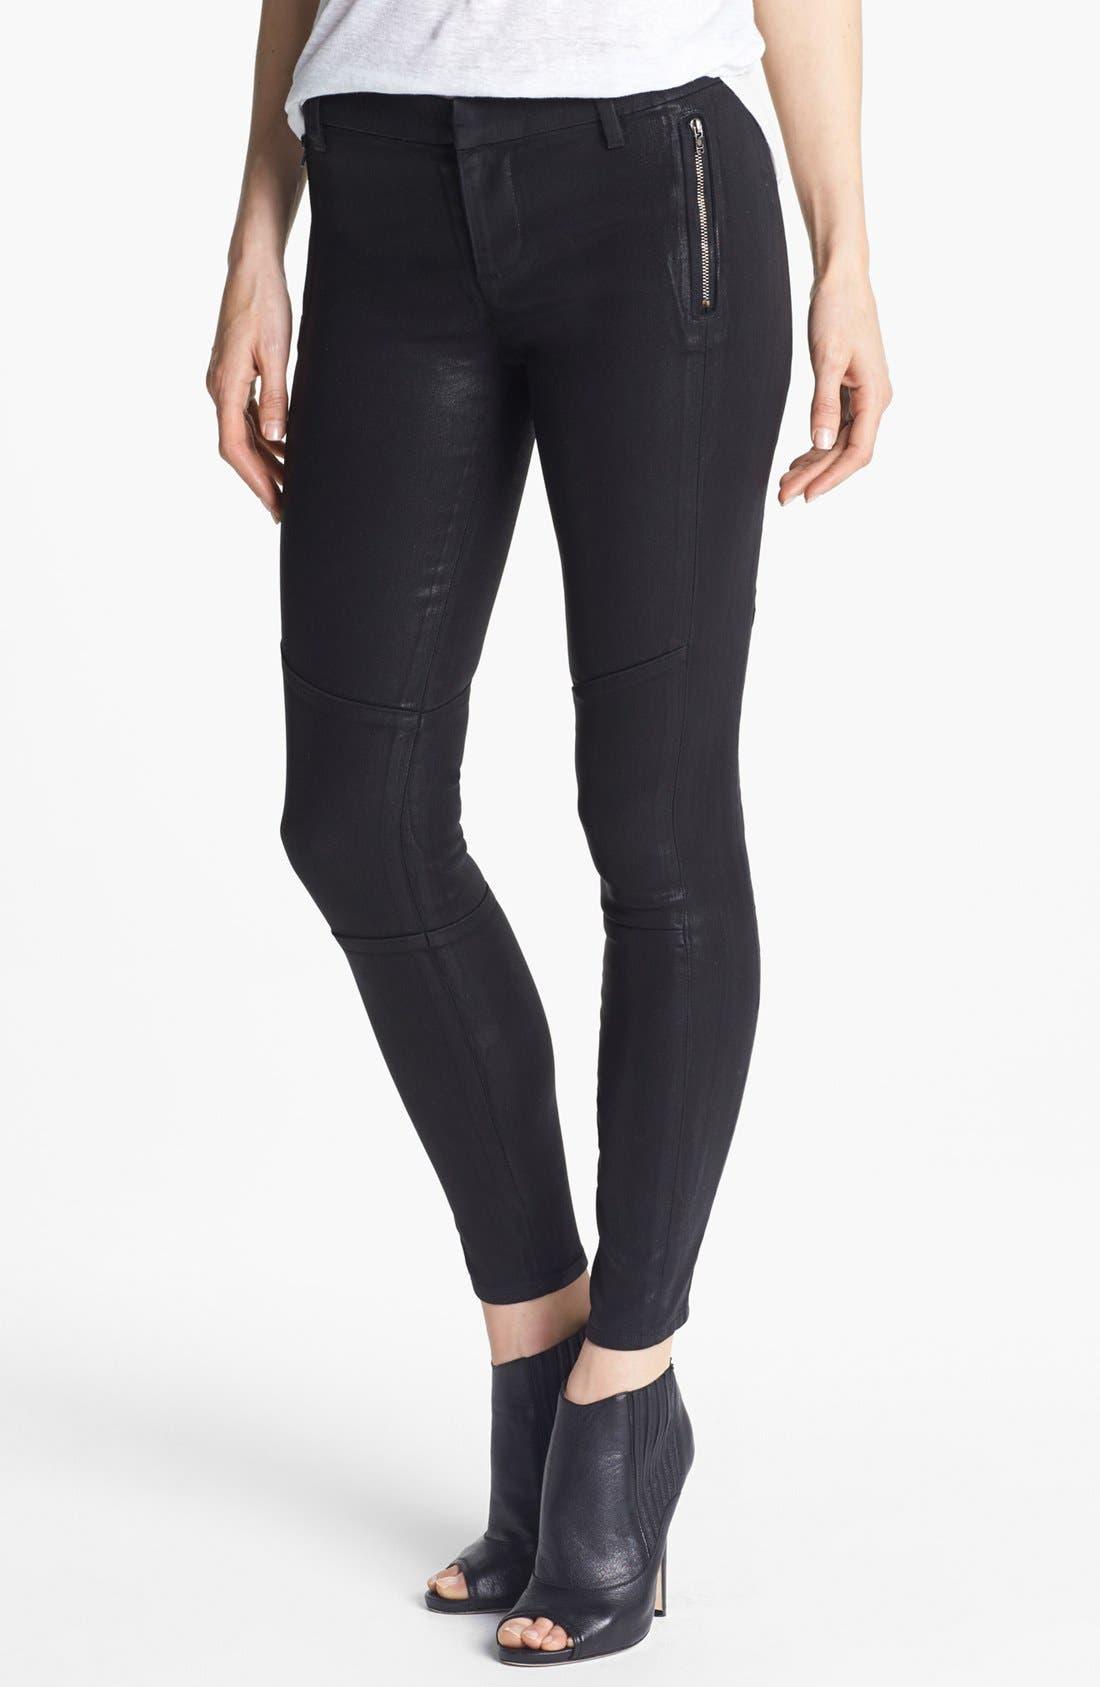 Main Image - J Brand '8046 Tabitha' Mid Rise Coated Skinny Jeans (Lacquered Black Quartz)